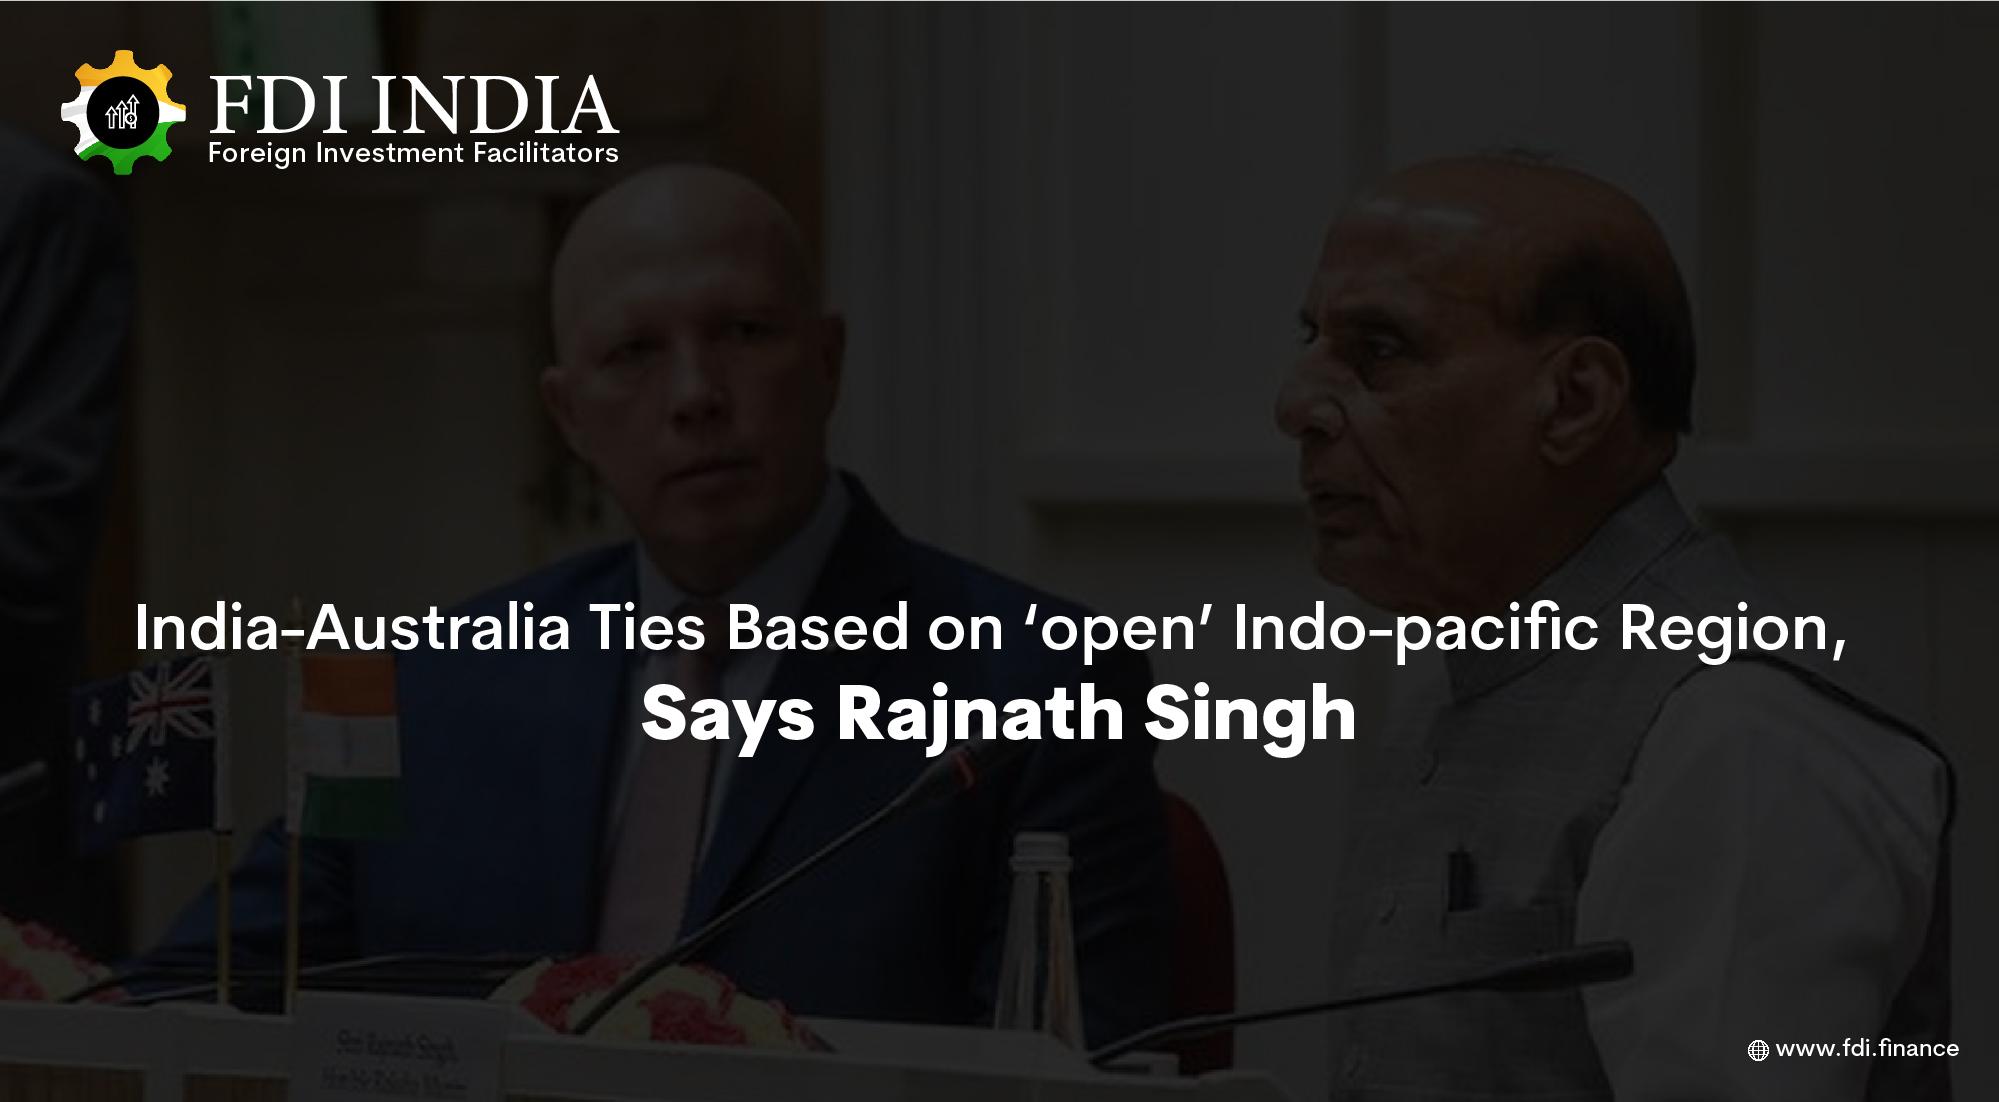 India-Australia Ties Based on 'open' Indo-pacific Region, Says Rajnath Singh